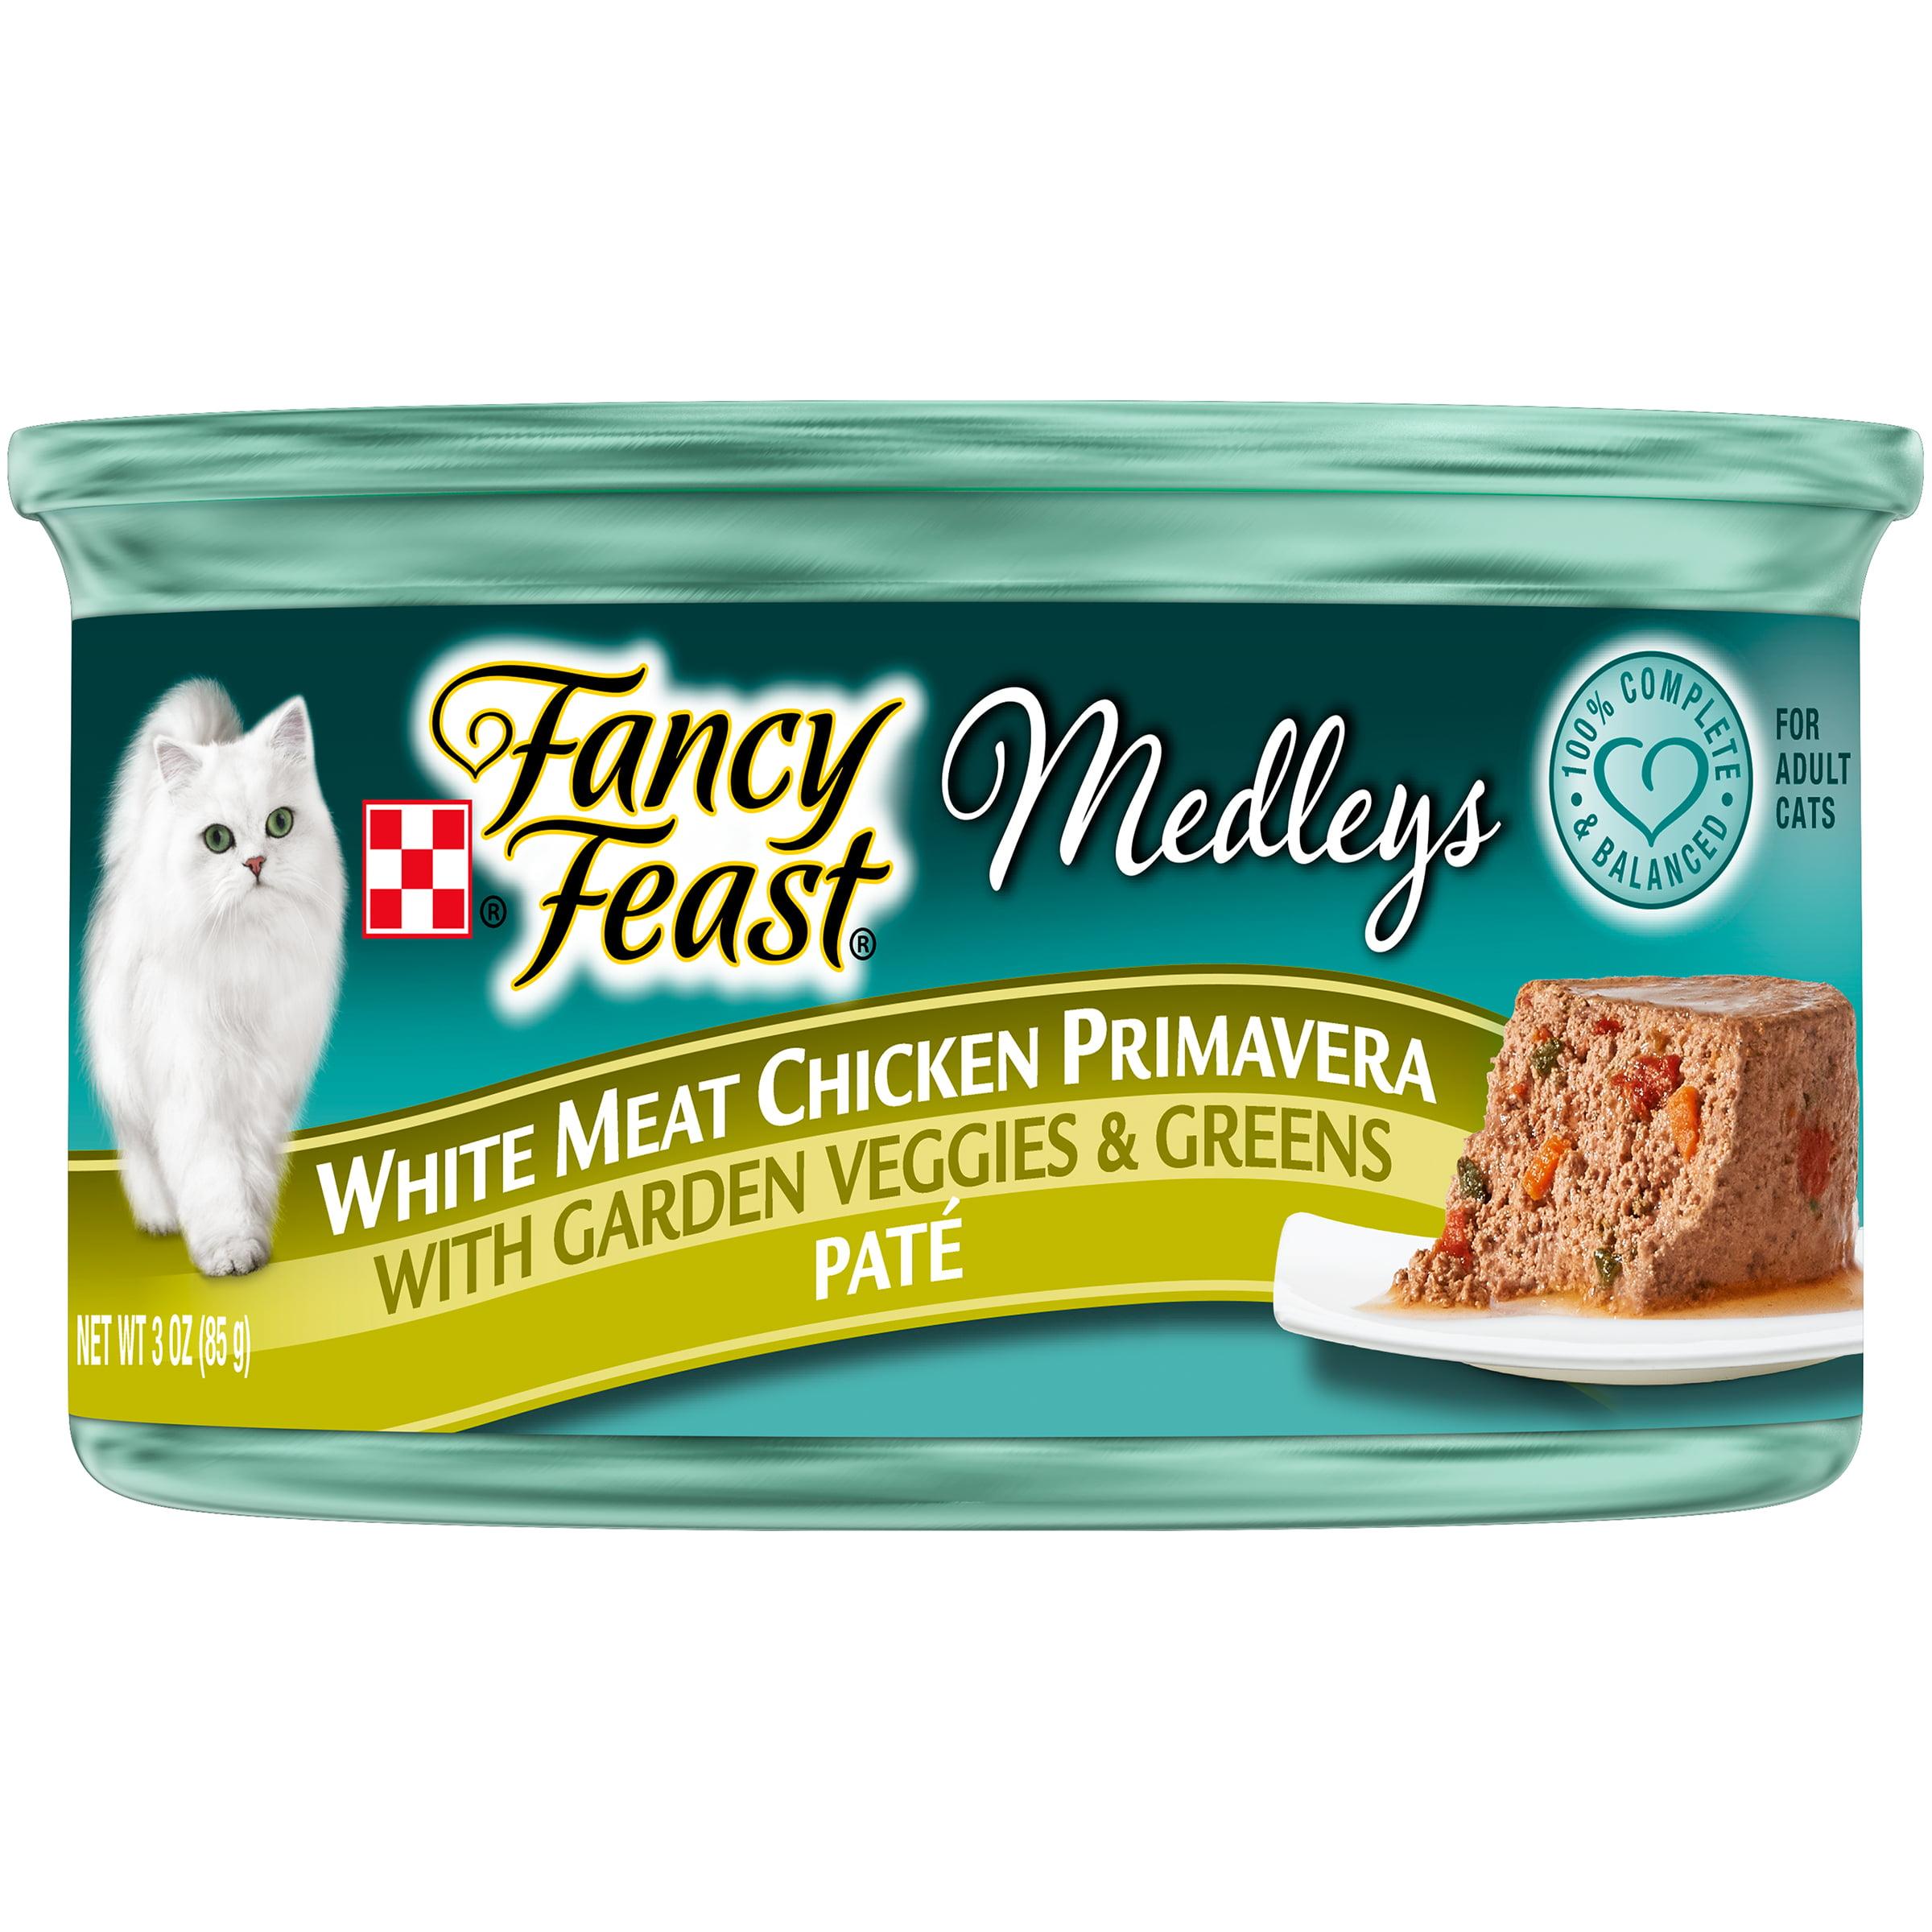 Purina Fancy Feast Medleys White Meat Chicken Primavera Paté Cat Food, 3 oz